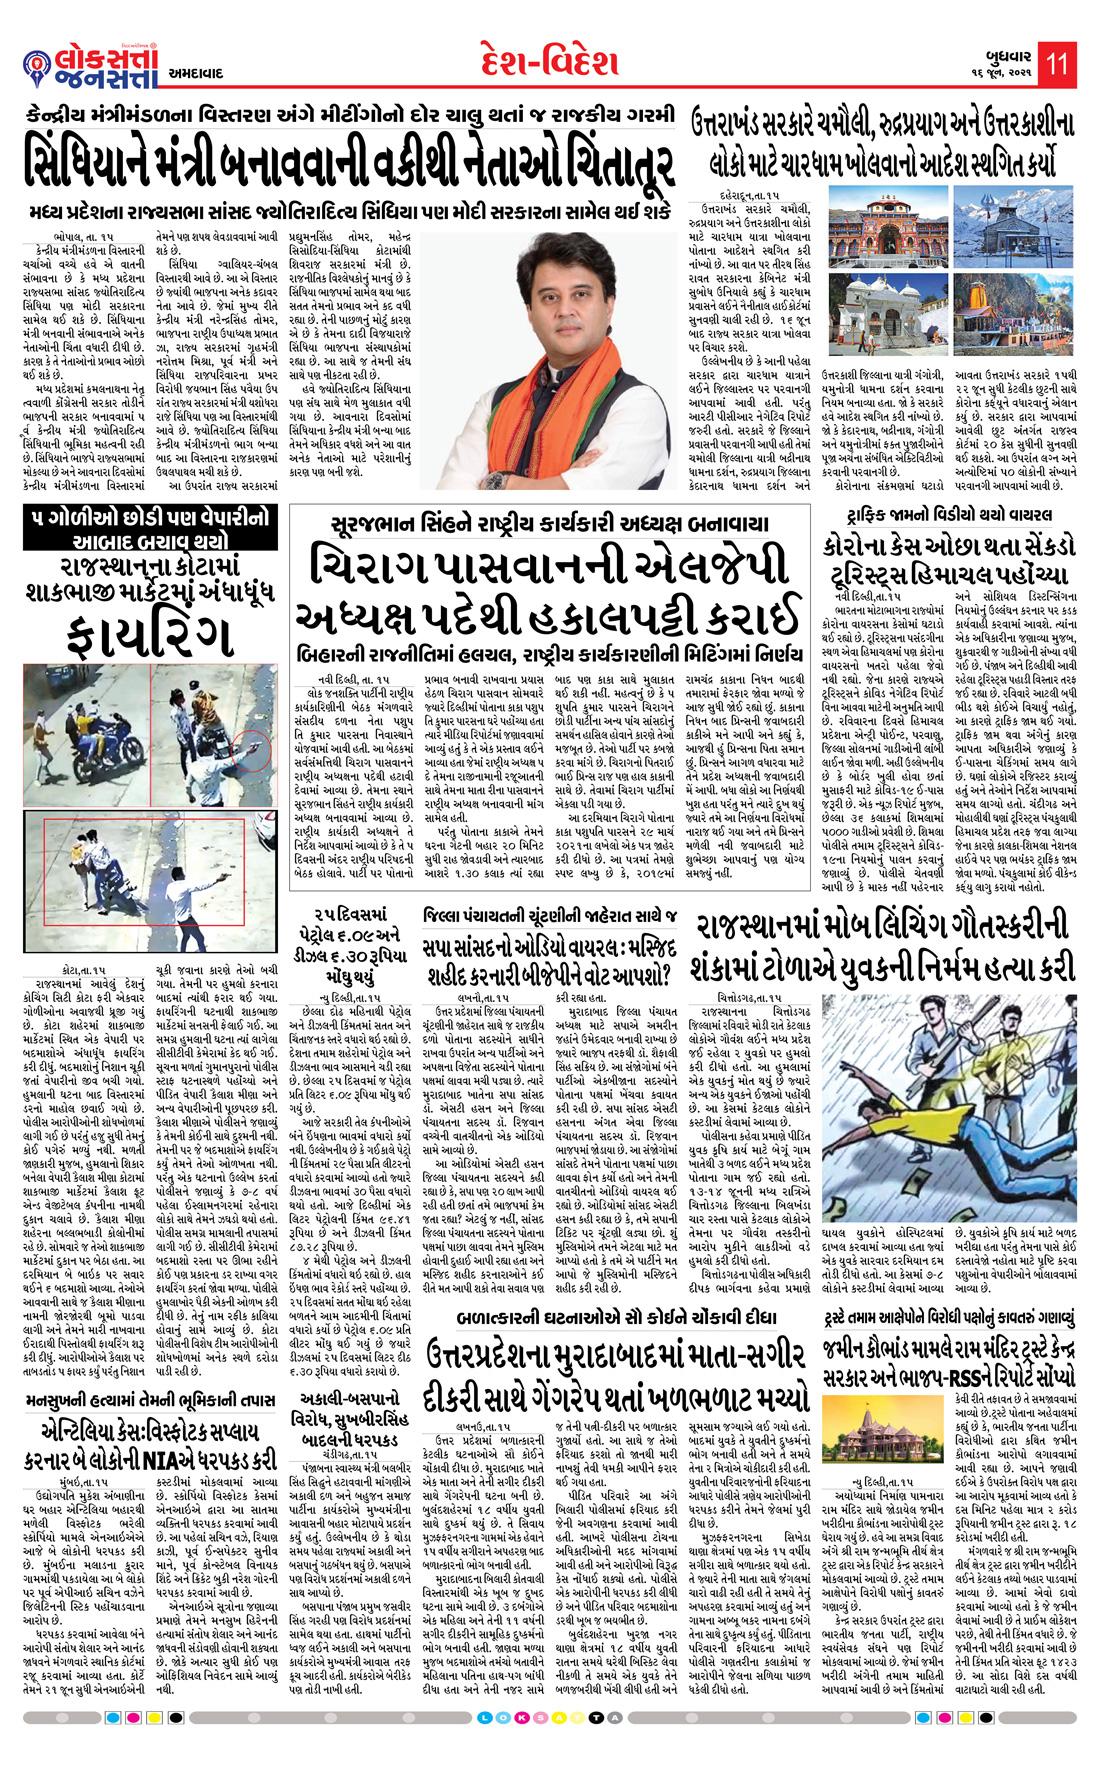 Loksatta Jansatta News Papaer E-paper dated 2021-06-16 | Page 11